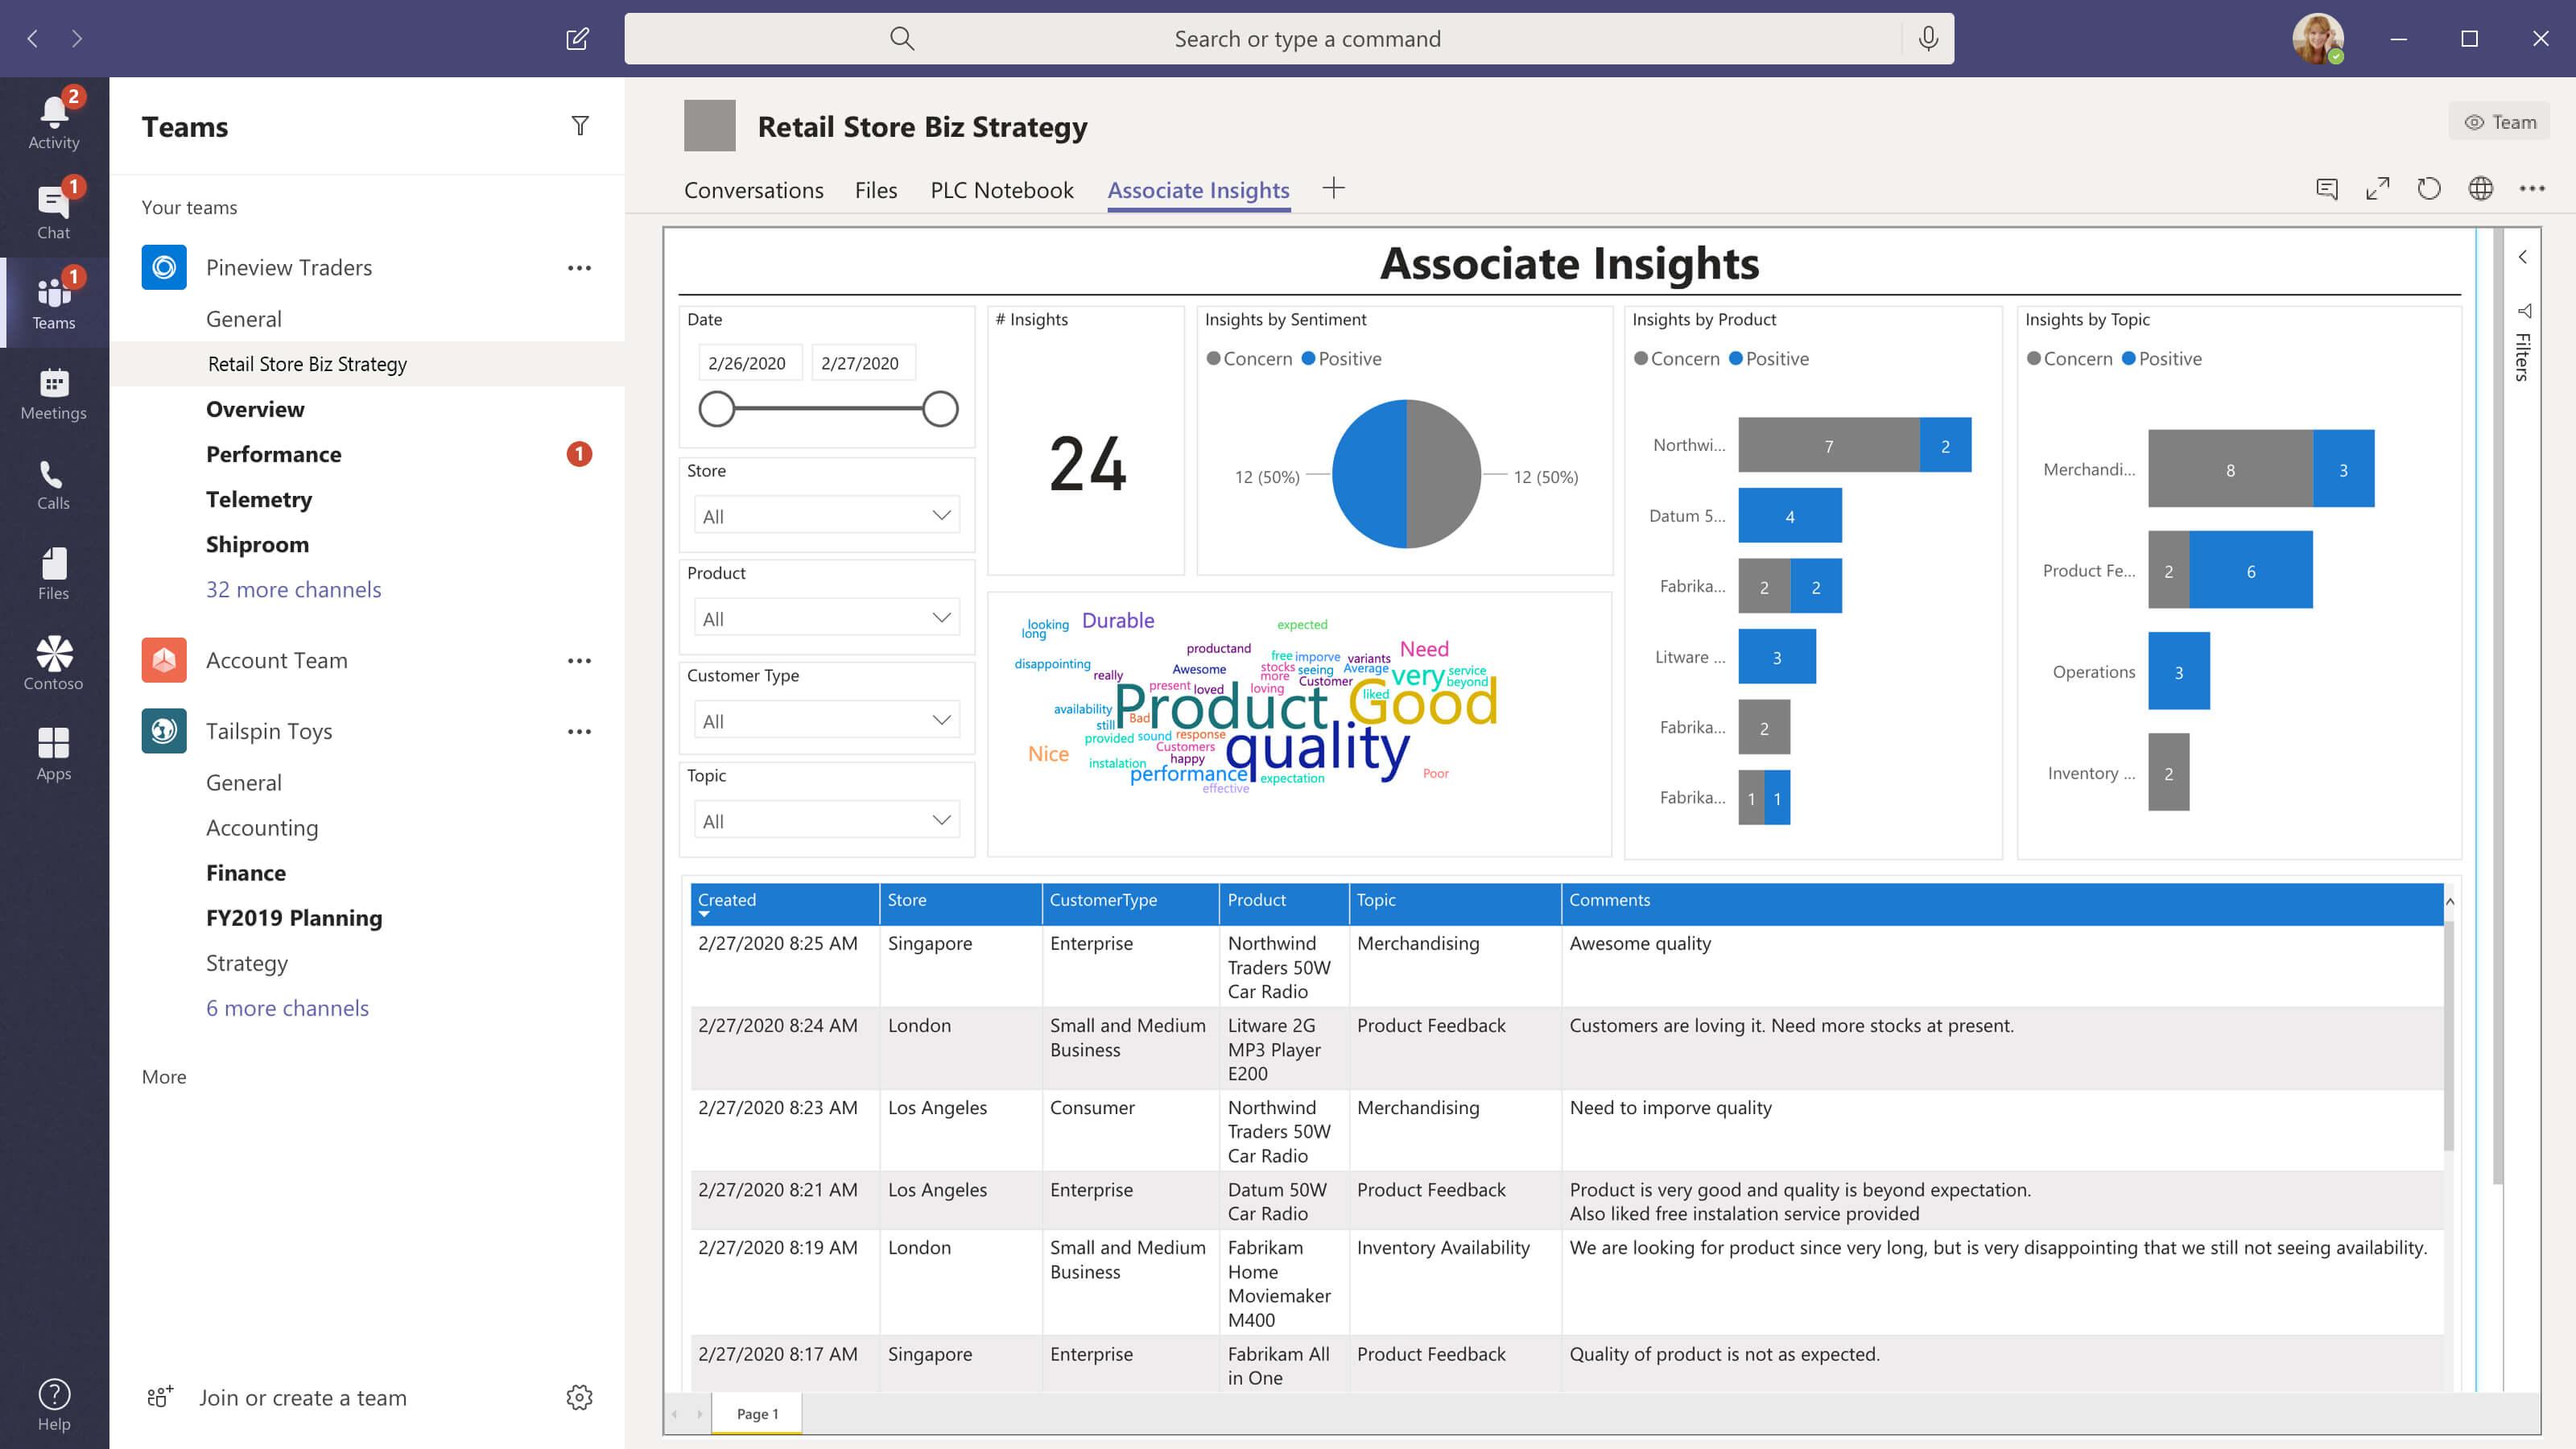 The dashboard of Microsoft Teams